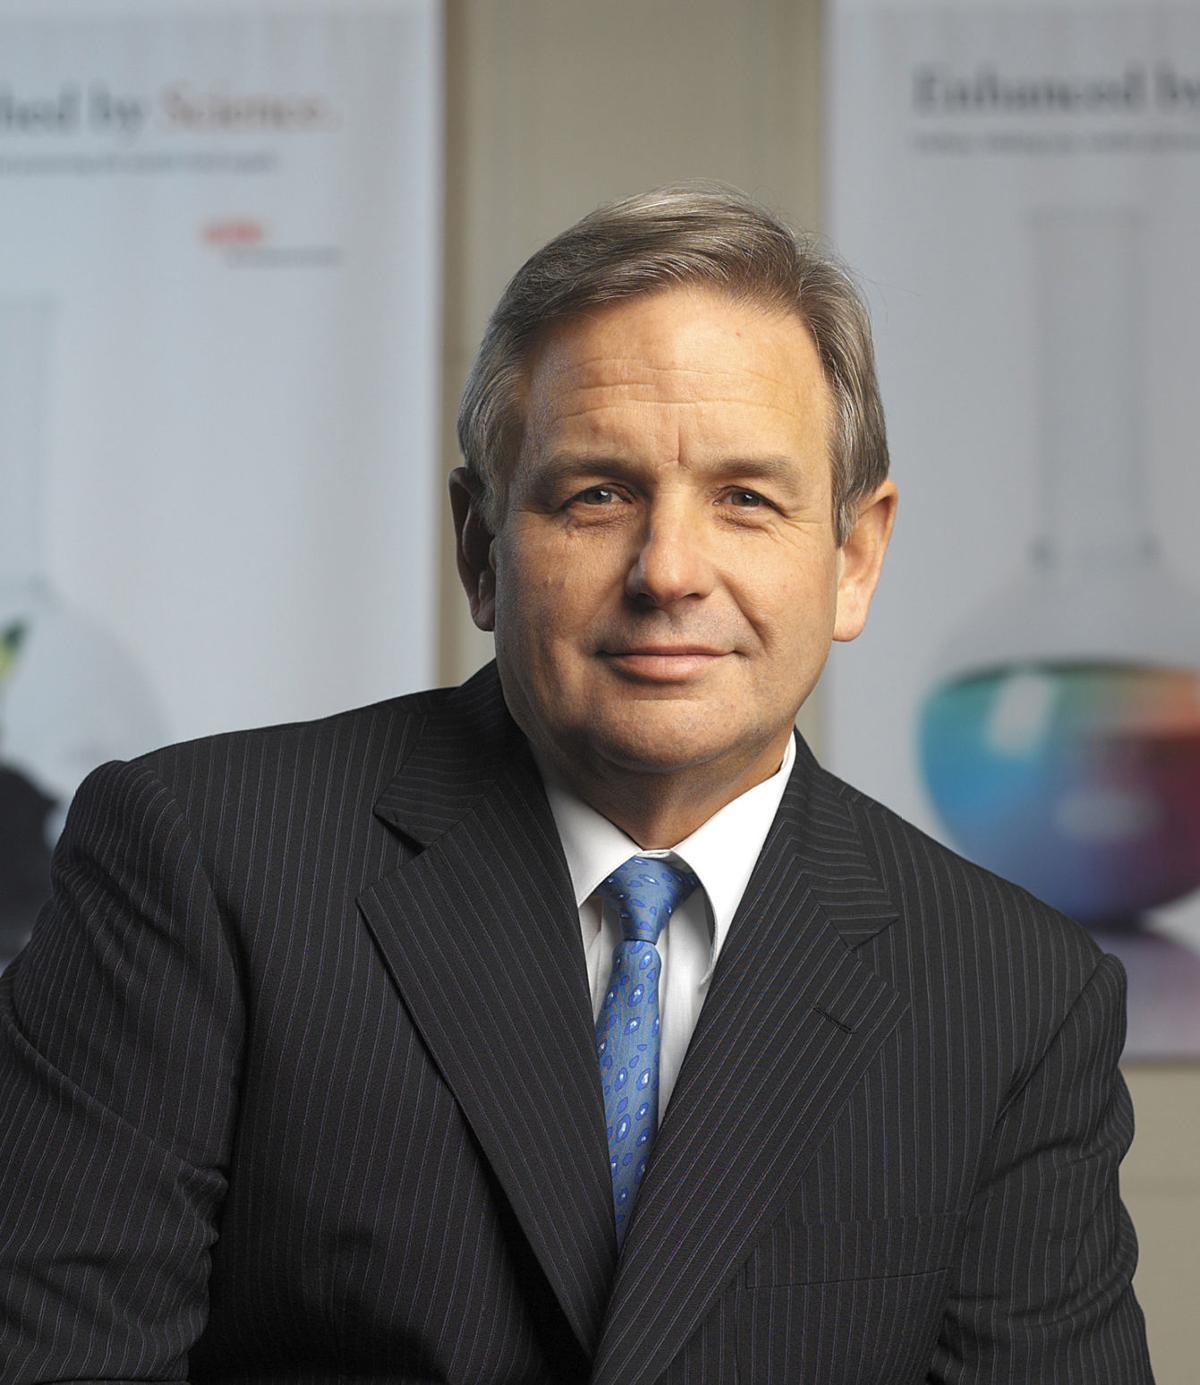 Chad Holliday, Deere board of directors